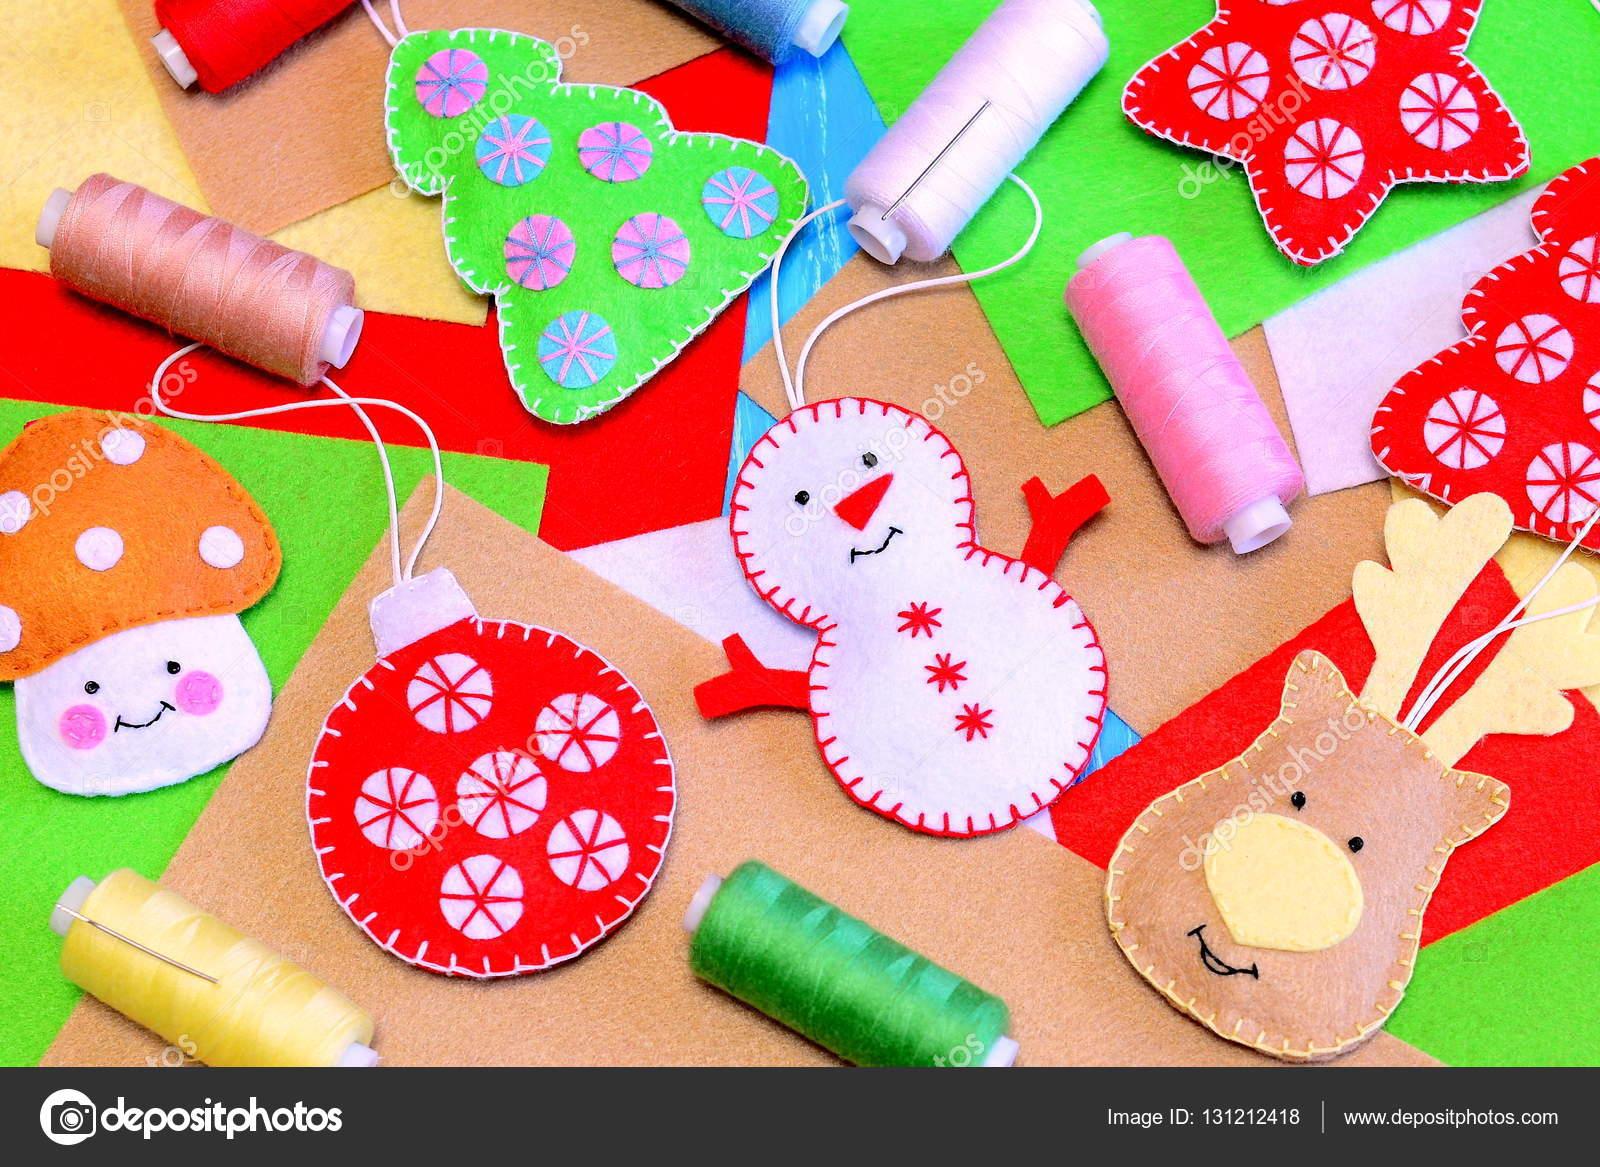 Children Christmas Tree Decorations.Felt Christmas Tree Ornaments Funny Felt Snowman Deer